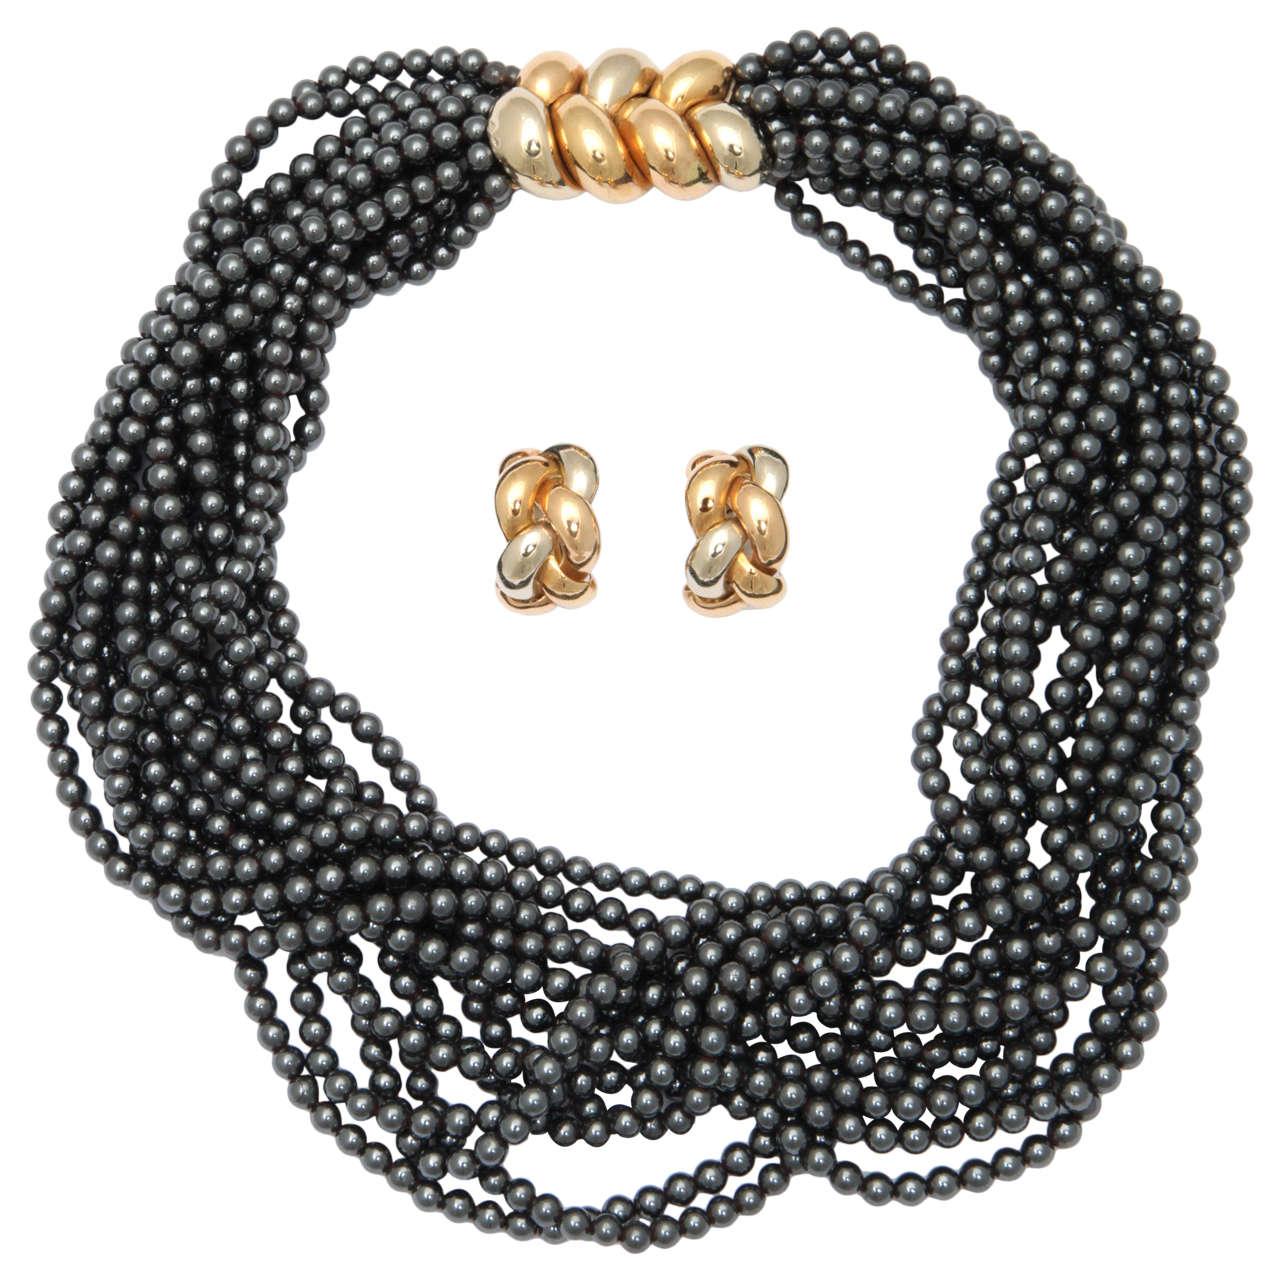 Poiray Multistrand Hematite Gold Necklace